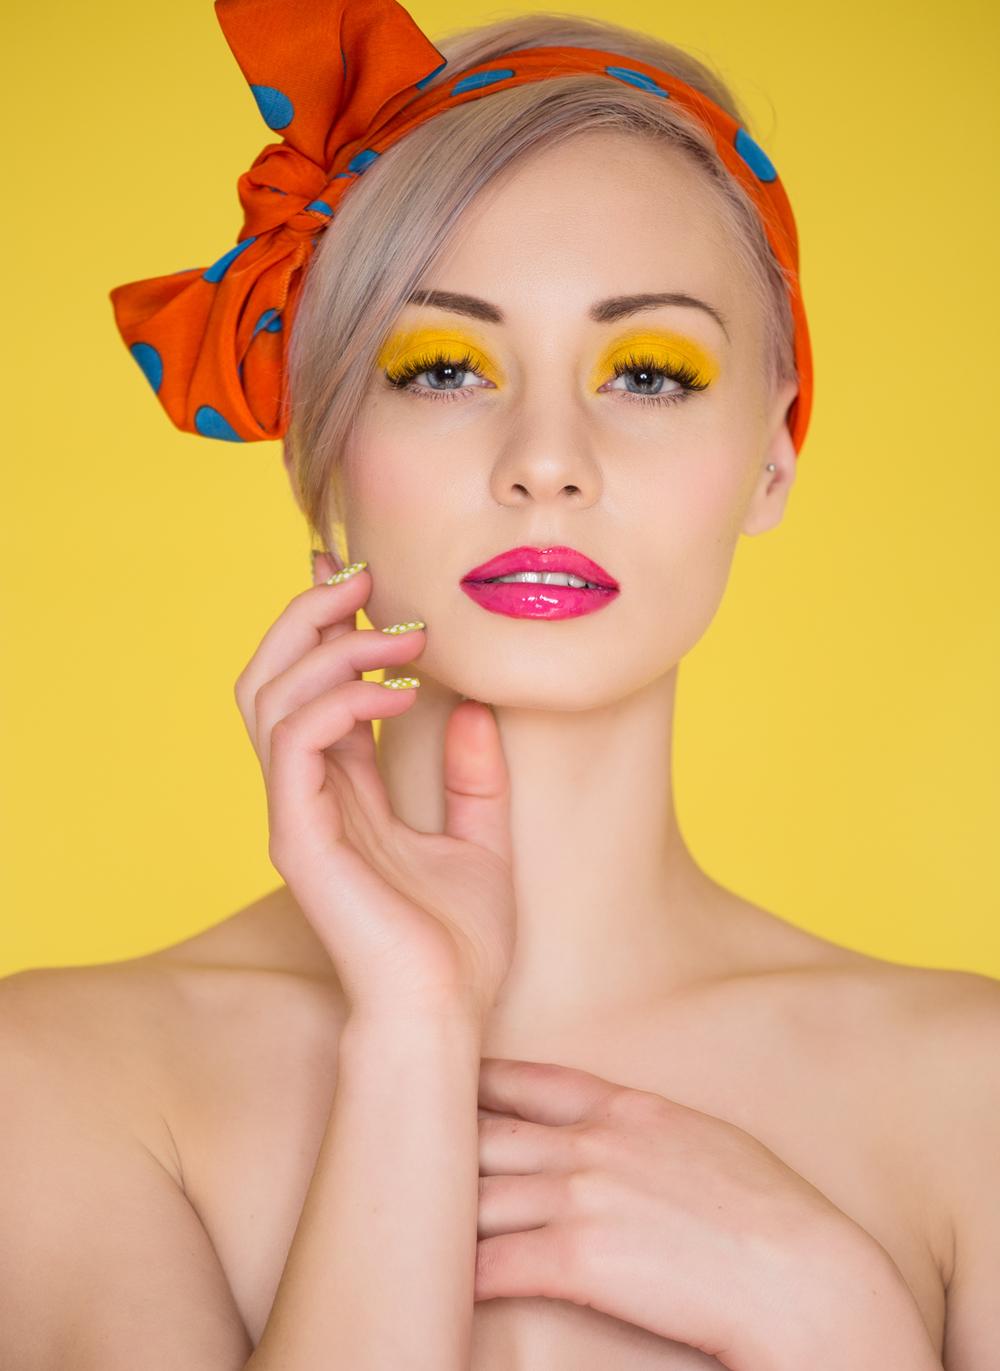 K14_0554-69-Kamal Mostofi-Beauty_ZyZi Makeup_Sally_80s-Edit.jpg